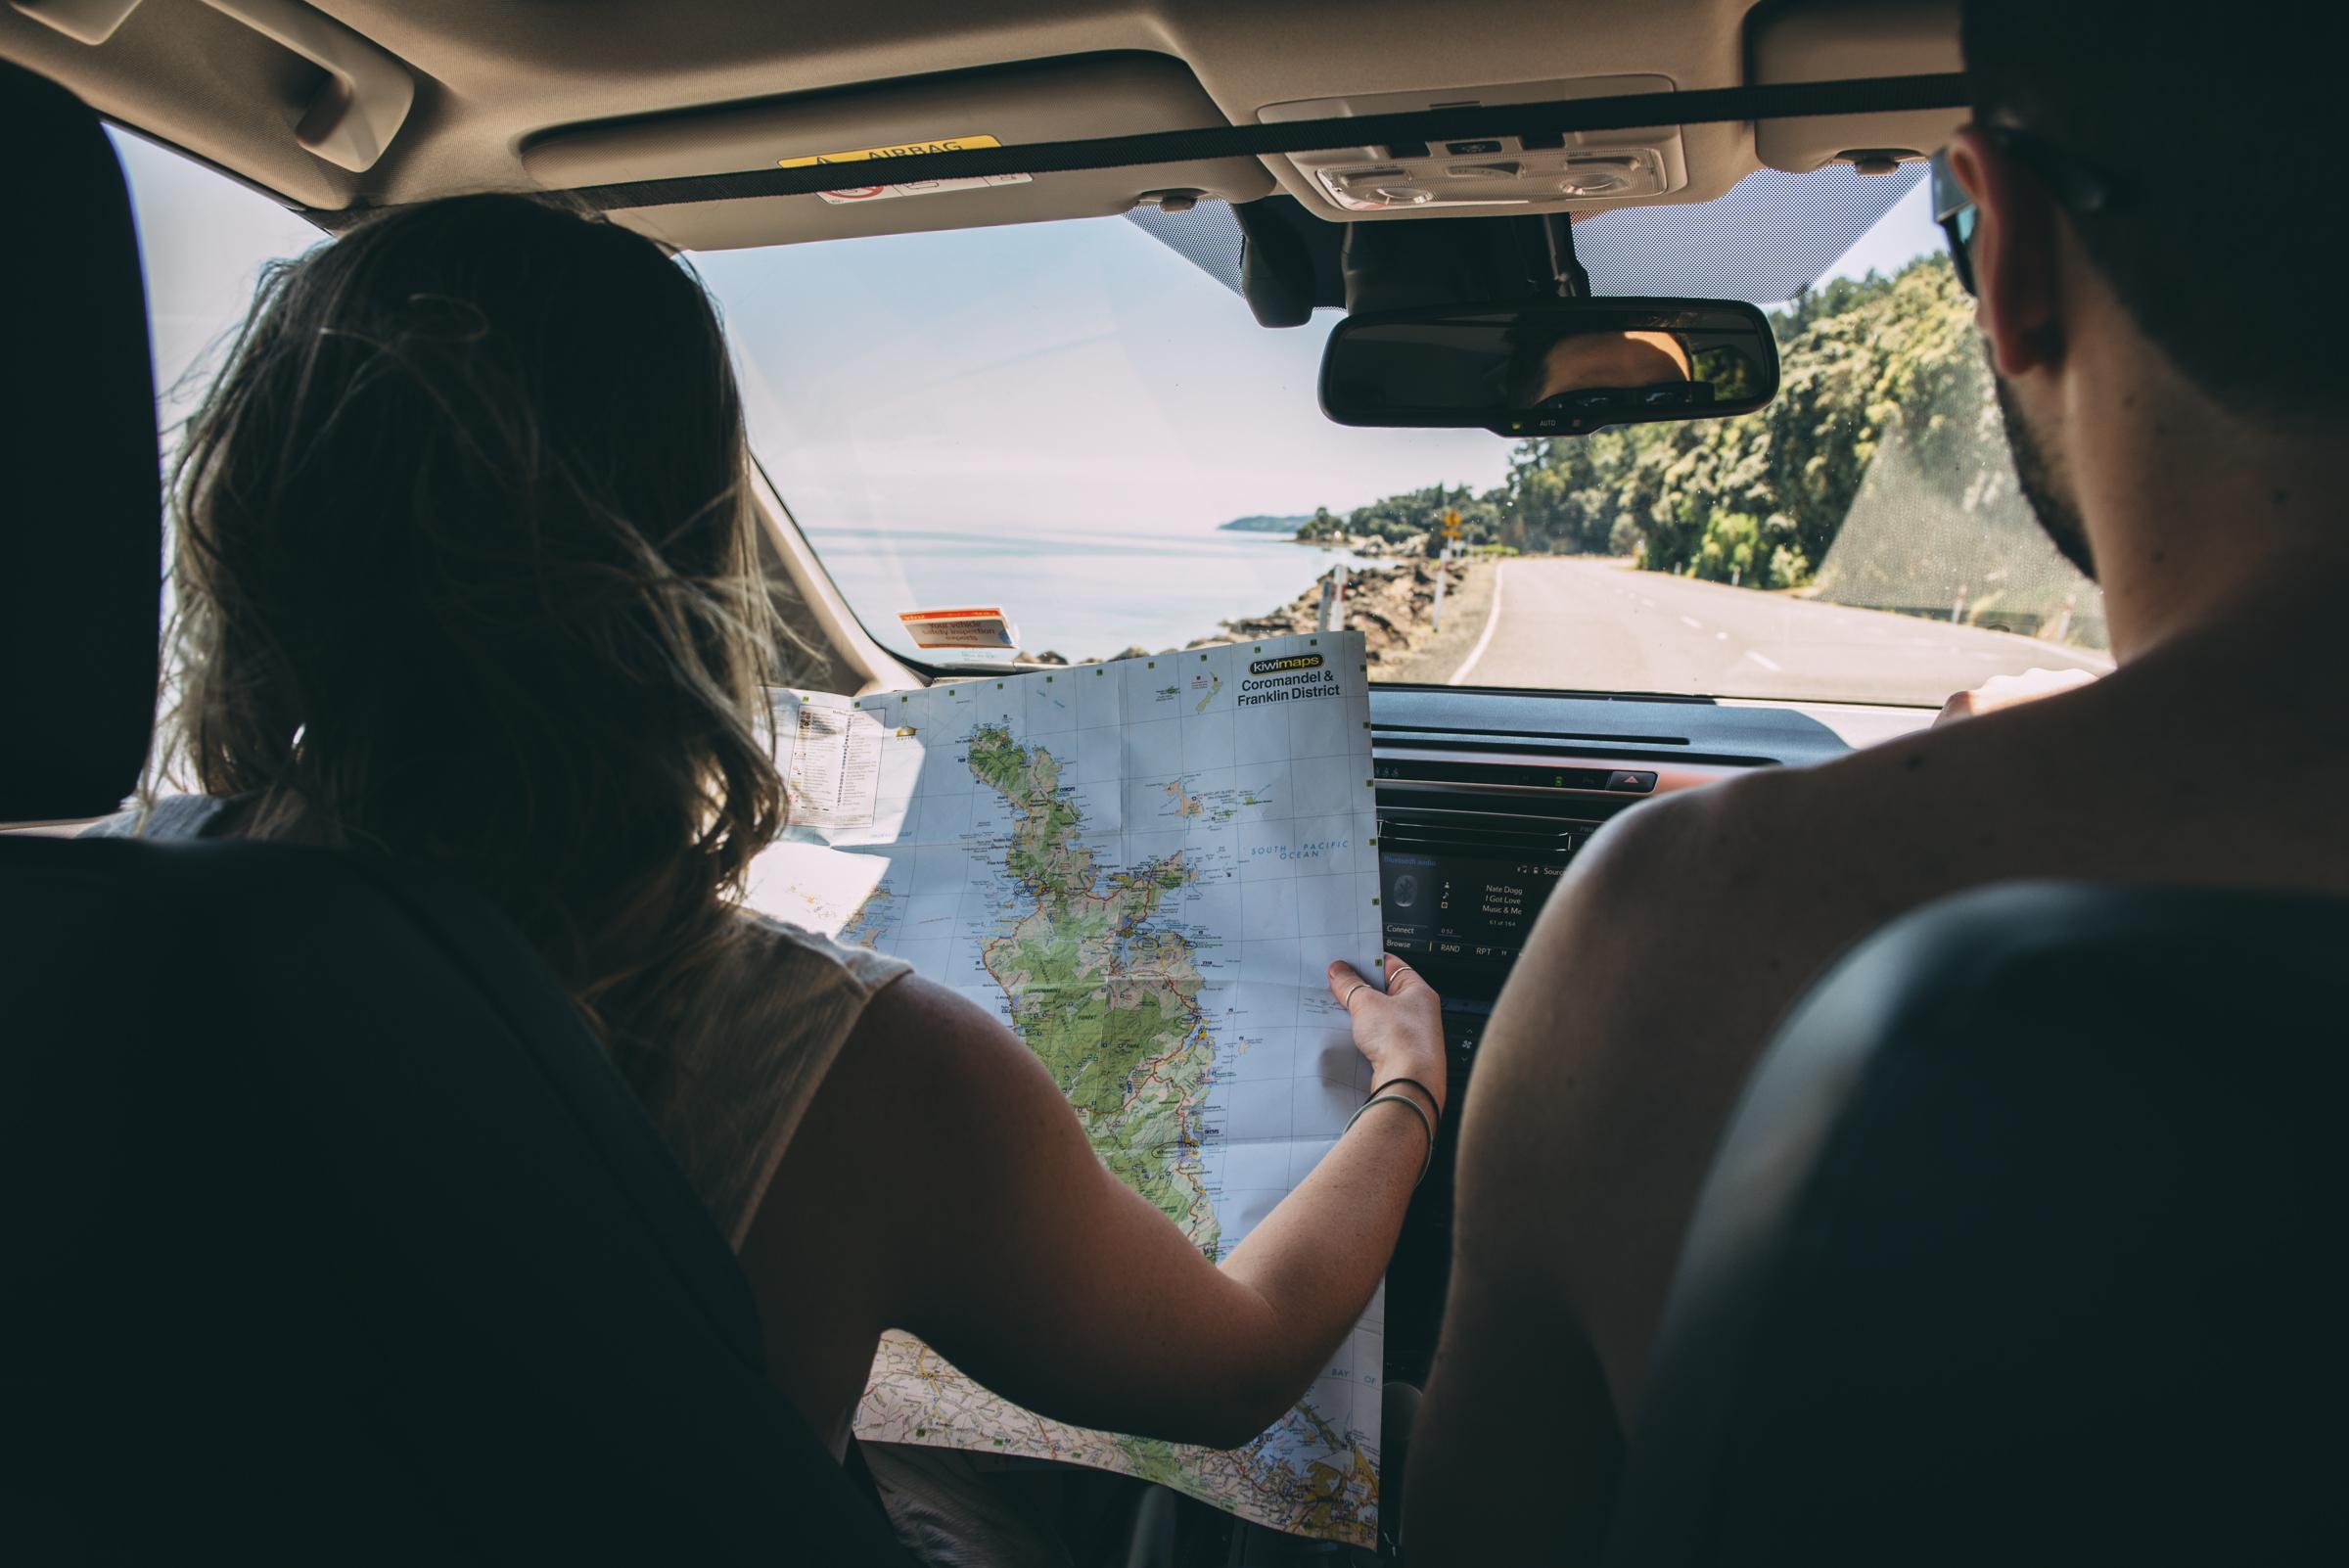 New Zealand Road Trip Lola Photography WEB_001.jpg